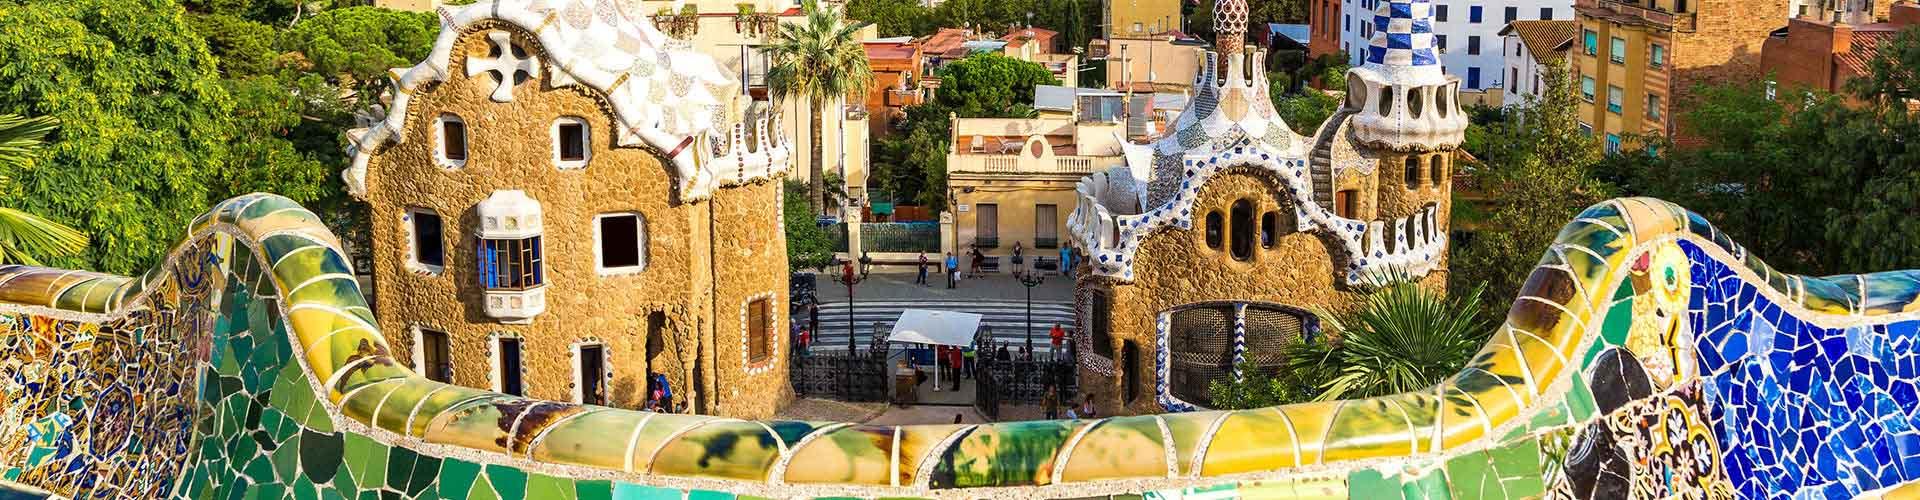 Barcelona - Hostales cerca a Park Güell. Mapas de Barcelona, Fotos y comentarios de cada Hostal en Barcelona.